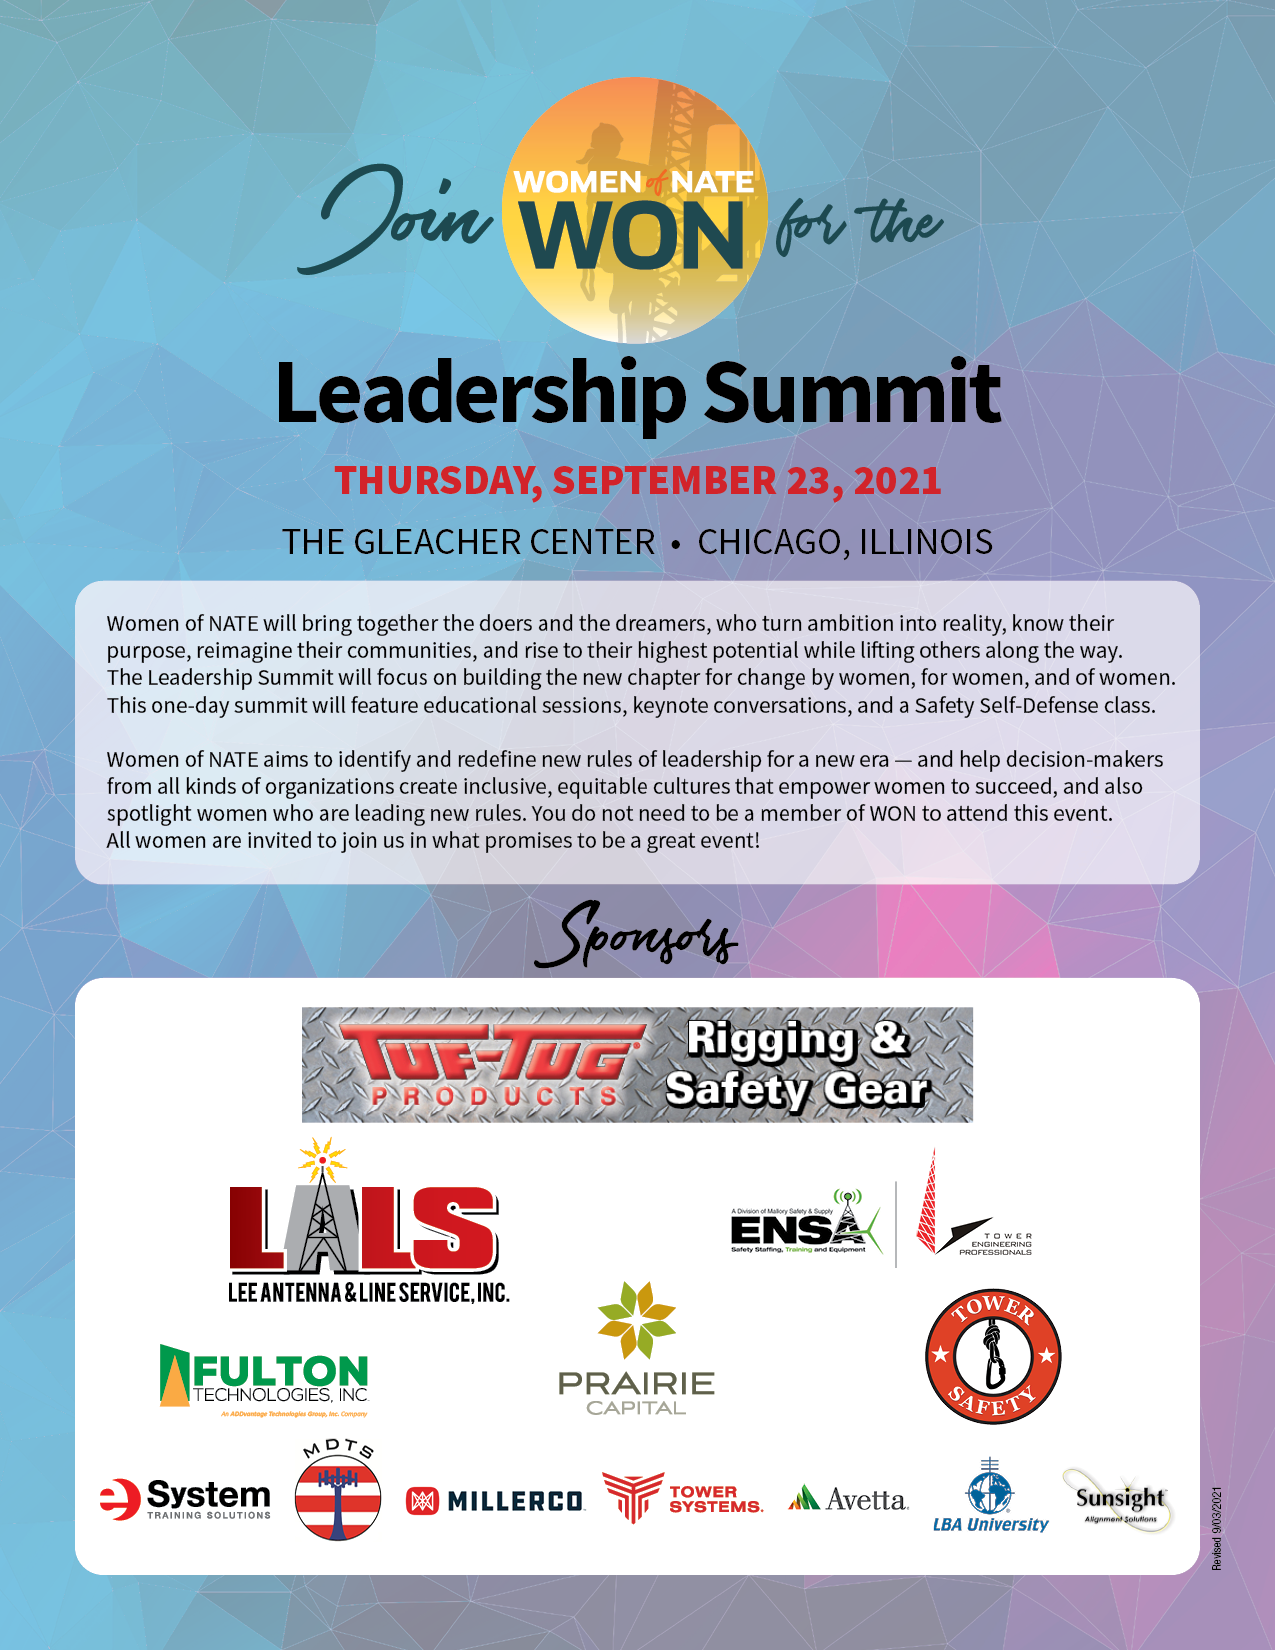 Won Summit 2021 Flyer W Speakers Rev 9 15 21